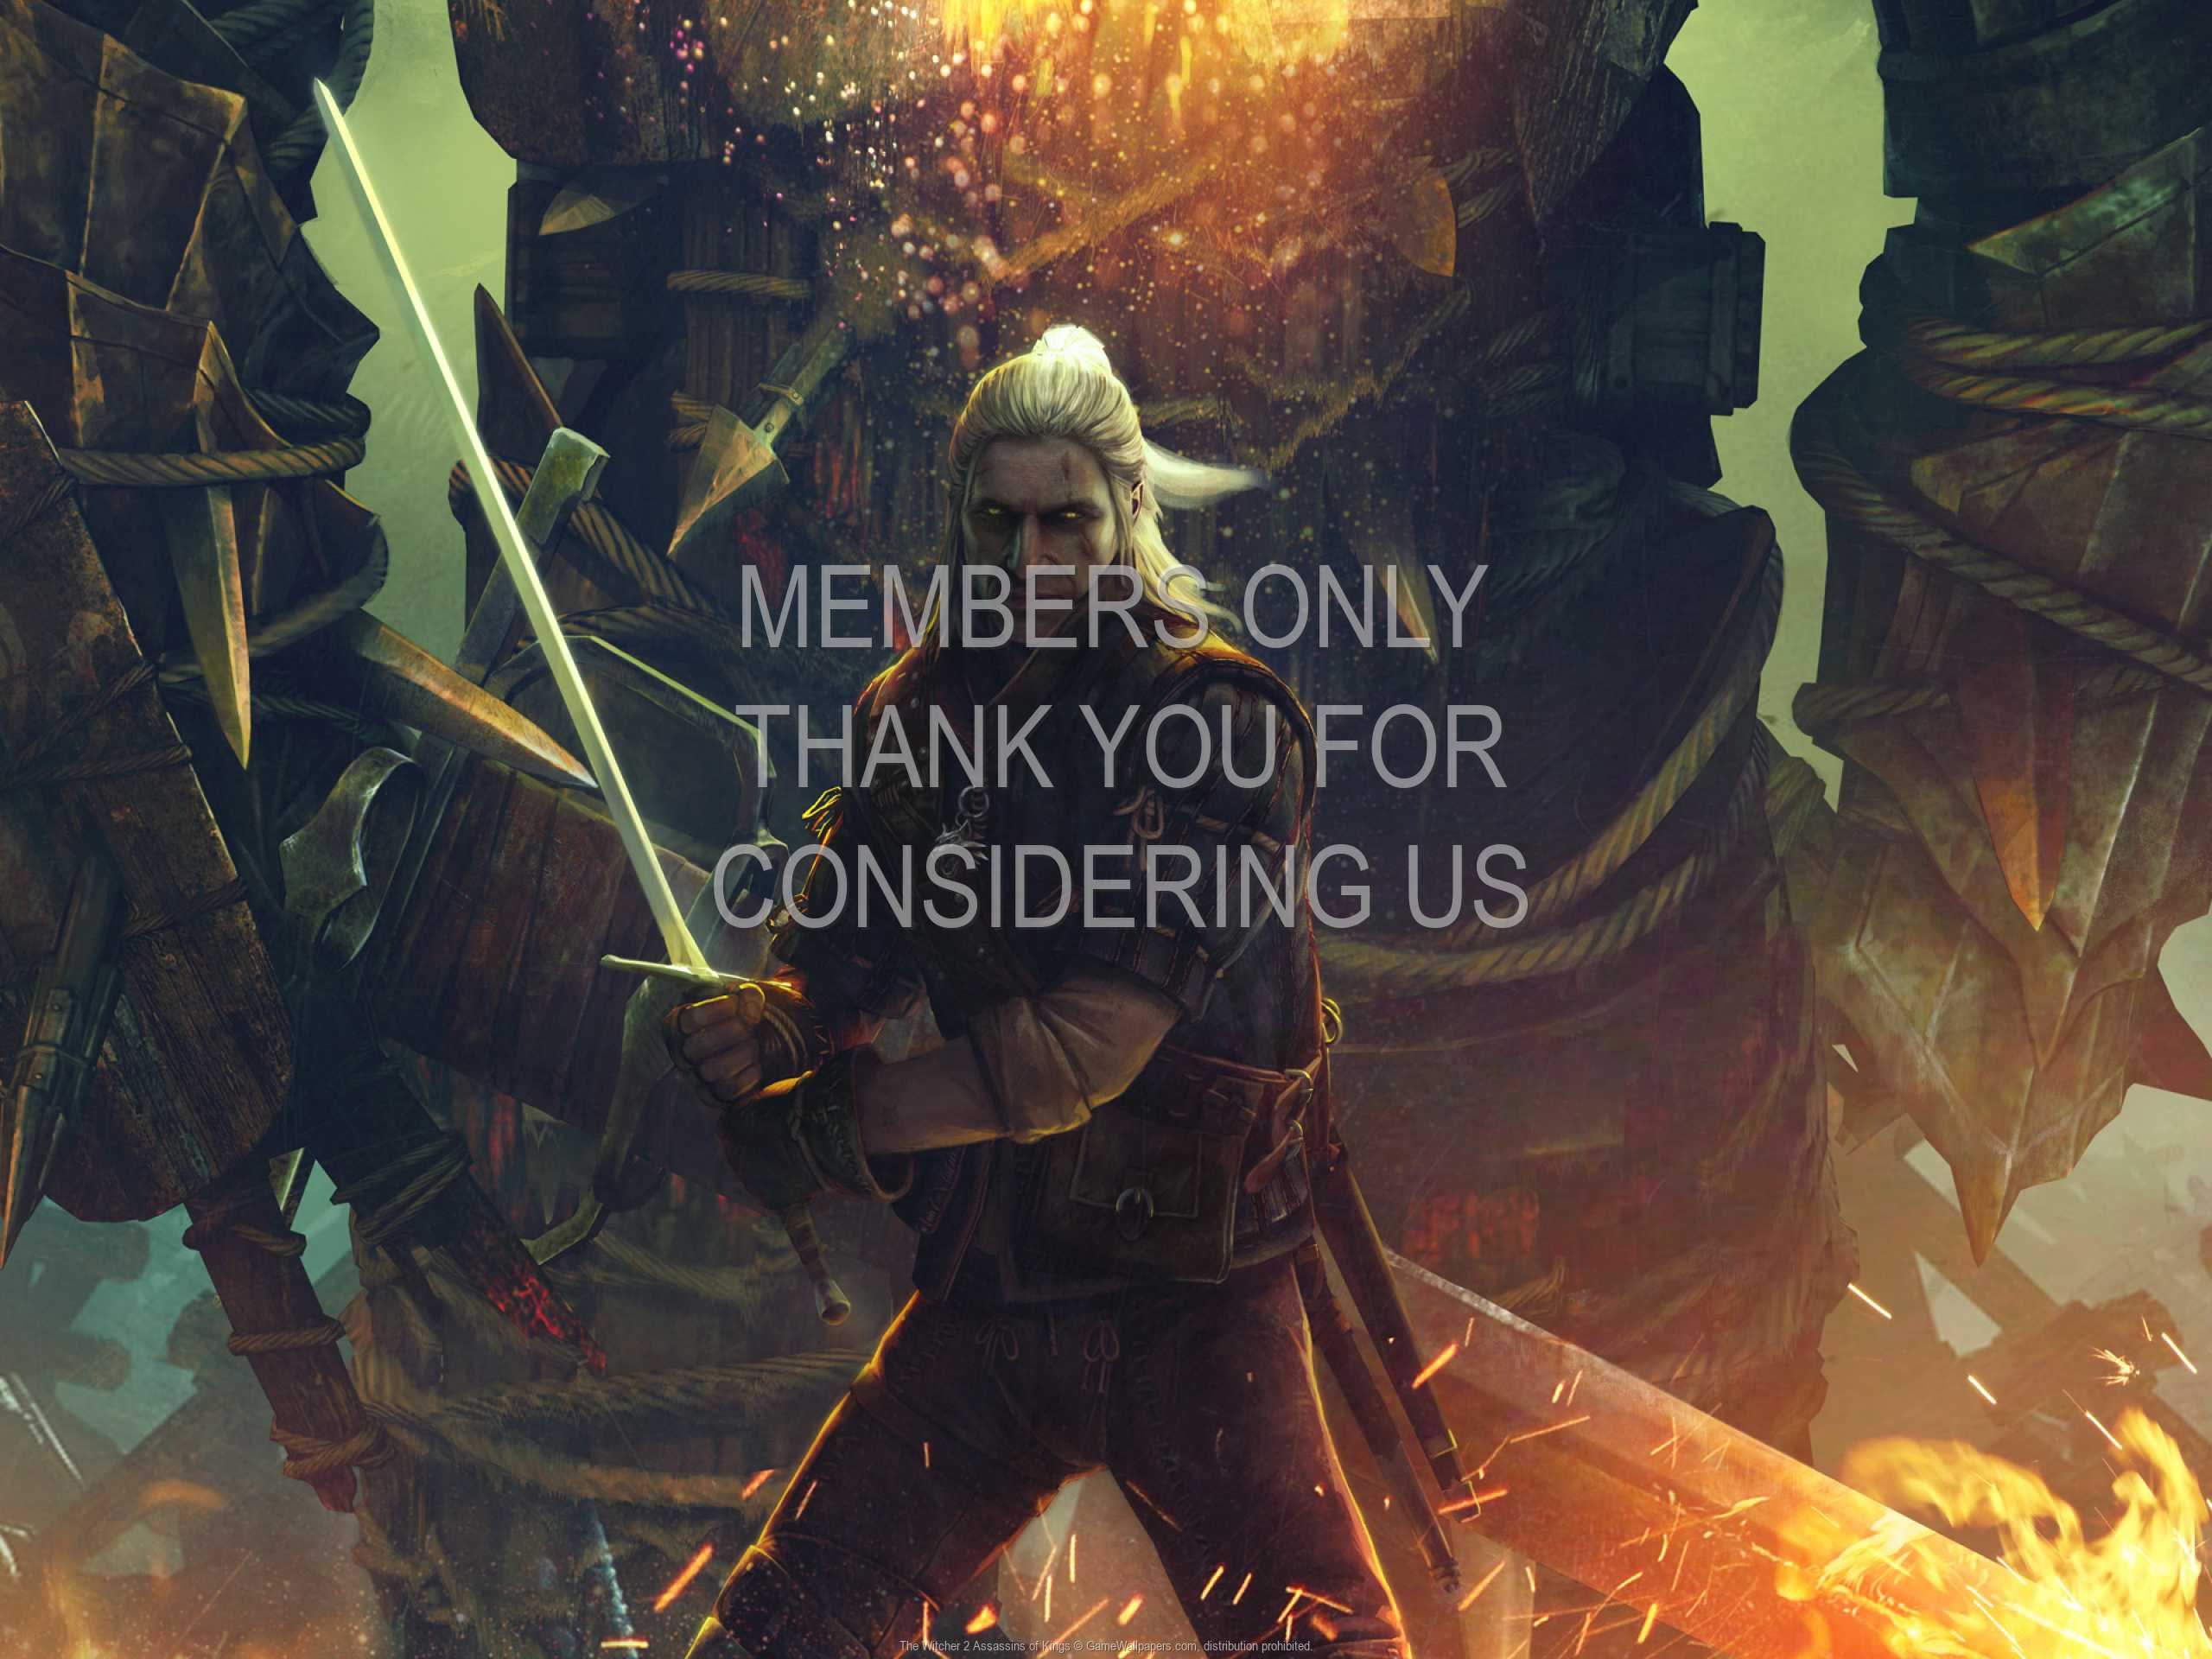 The Witcher 2: Assassins of Kings 1080p Horizontal Handy Hintergrundbild 07